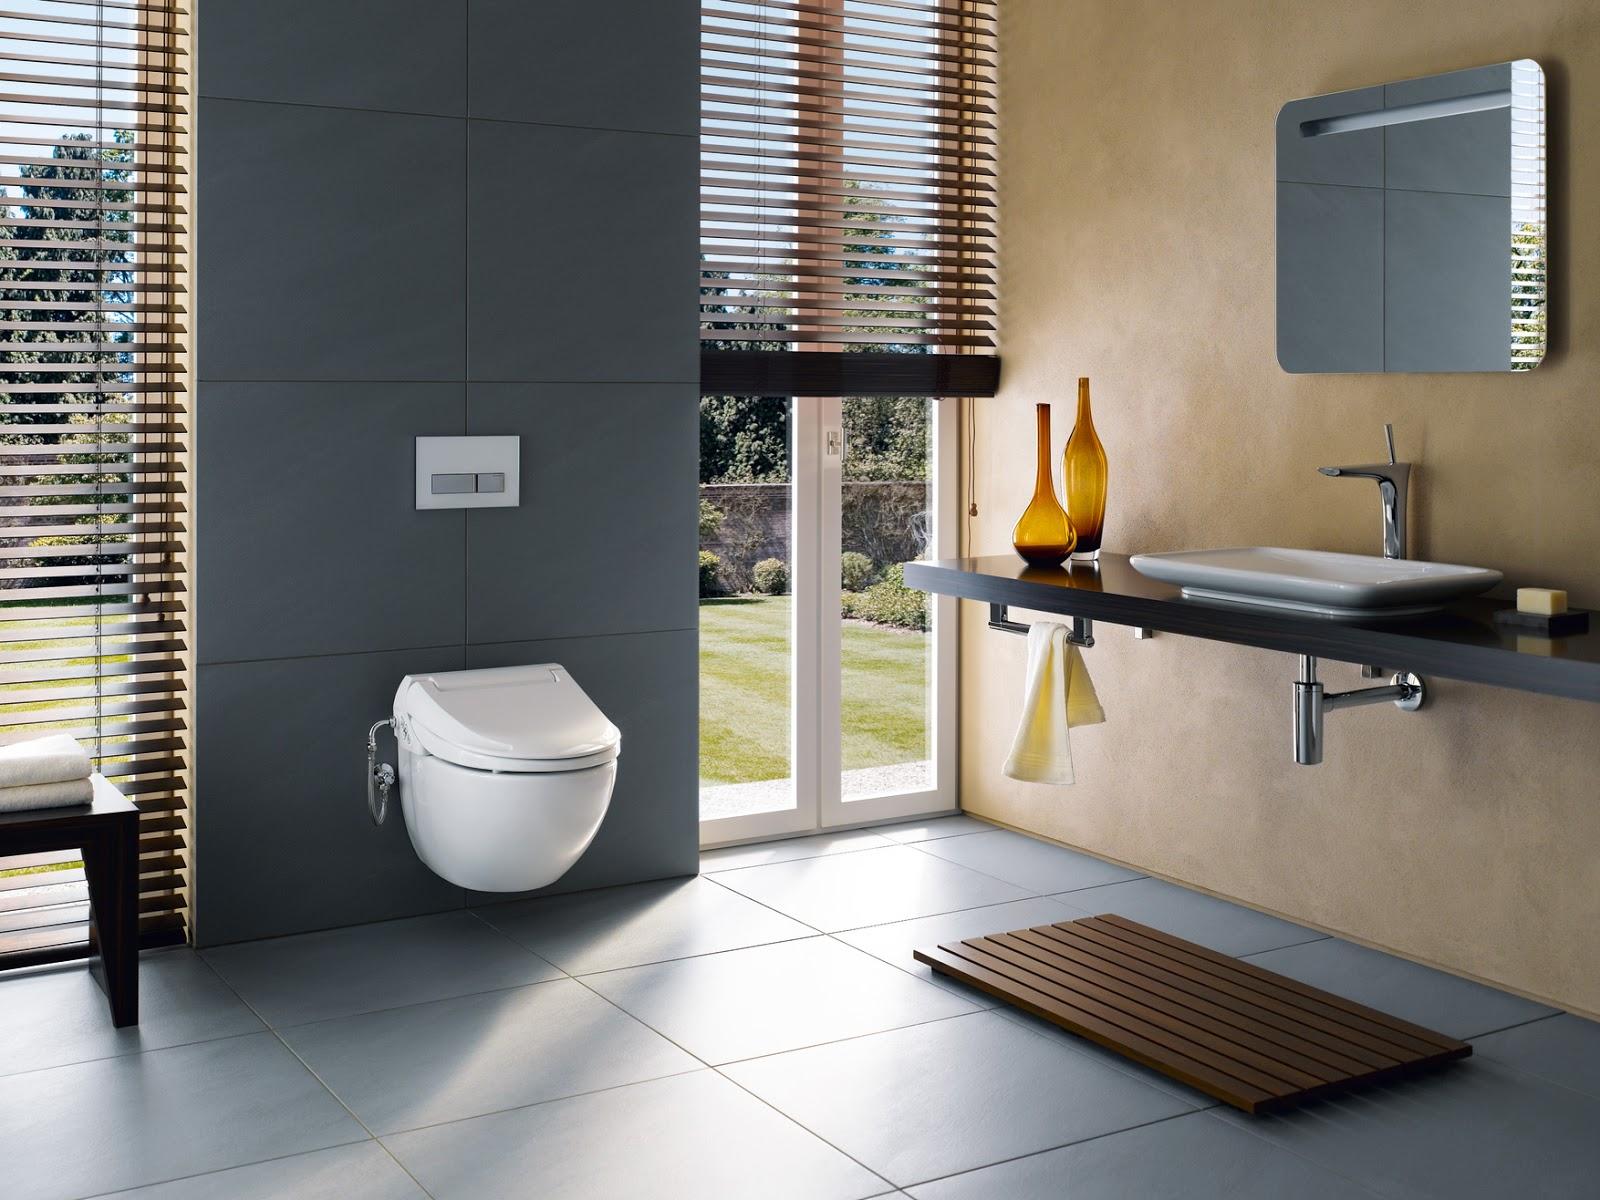 Dusch Wc Erfahrungen im test geberit aquaclean 4000 getestet